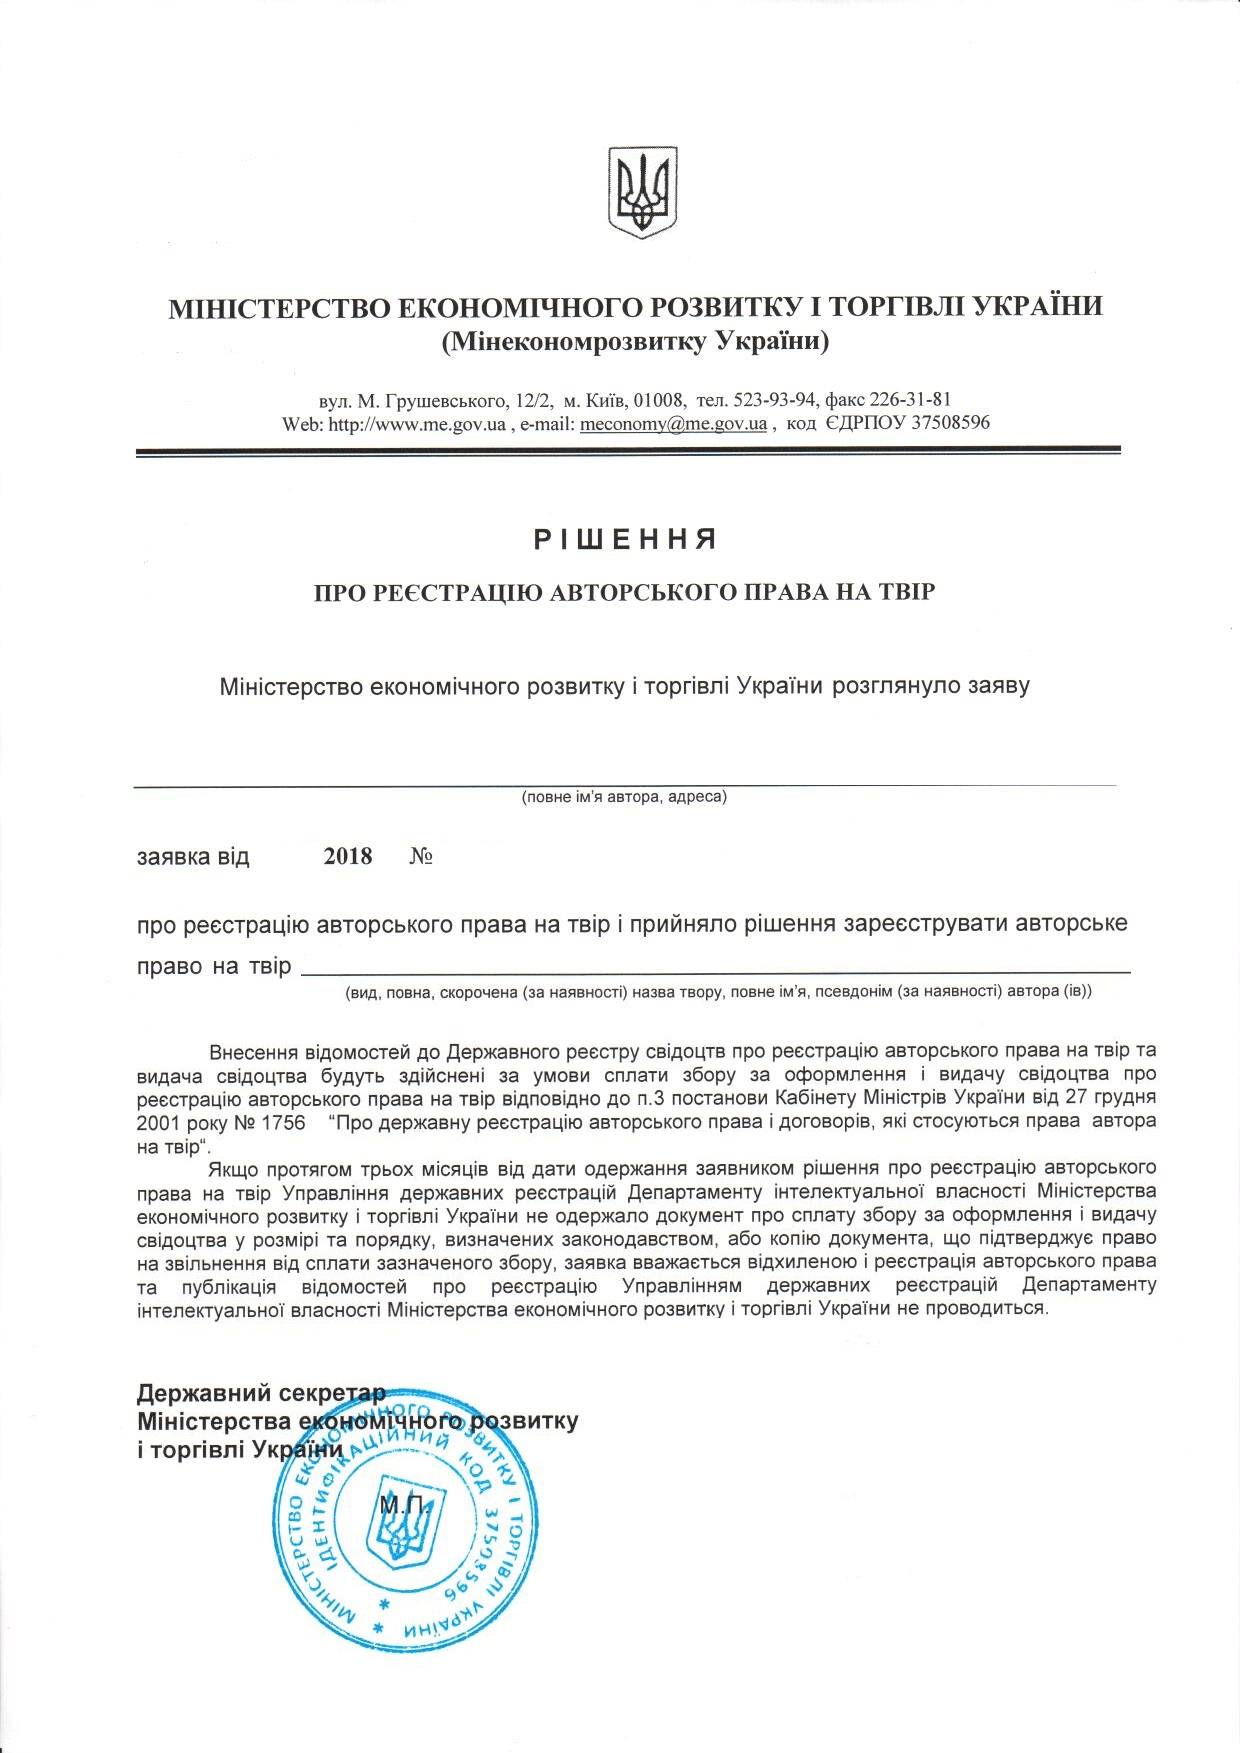 Решение о регистрации авторского права на произведение